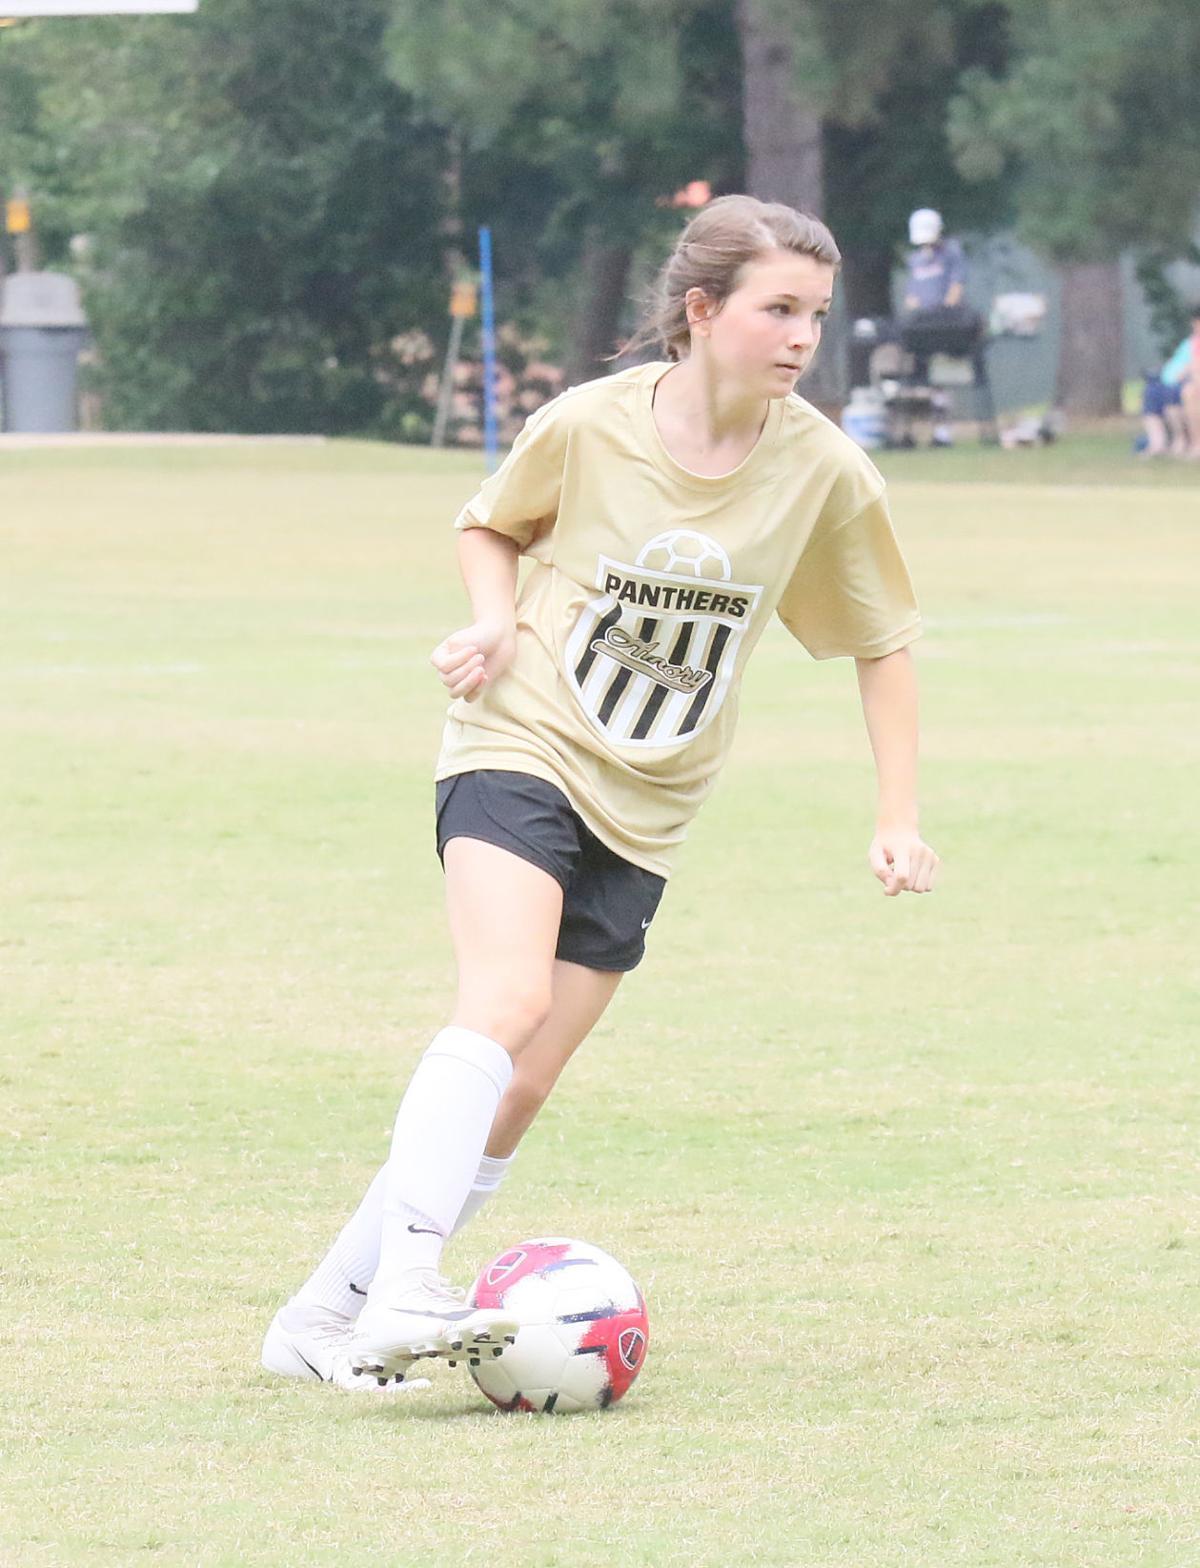 mcj-2019-06-12-sports-amory-soccer2-3c